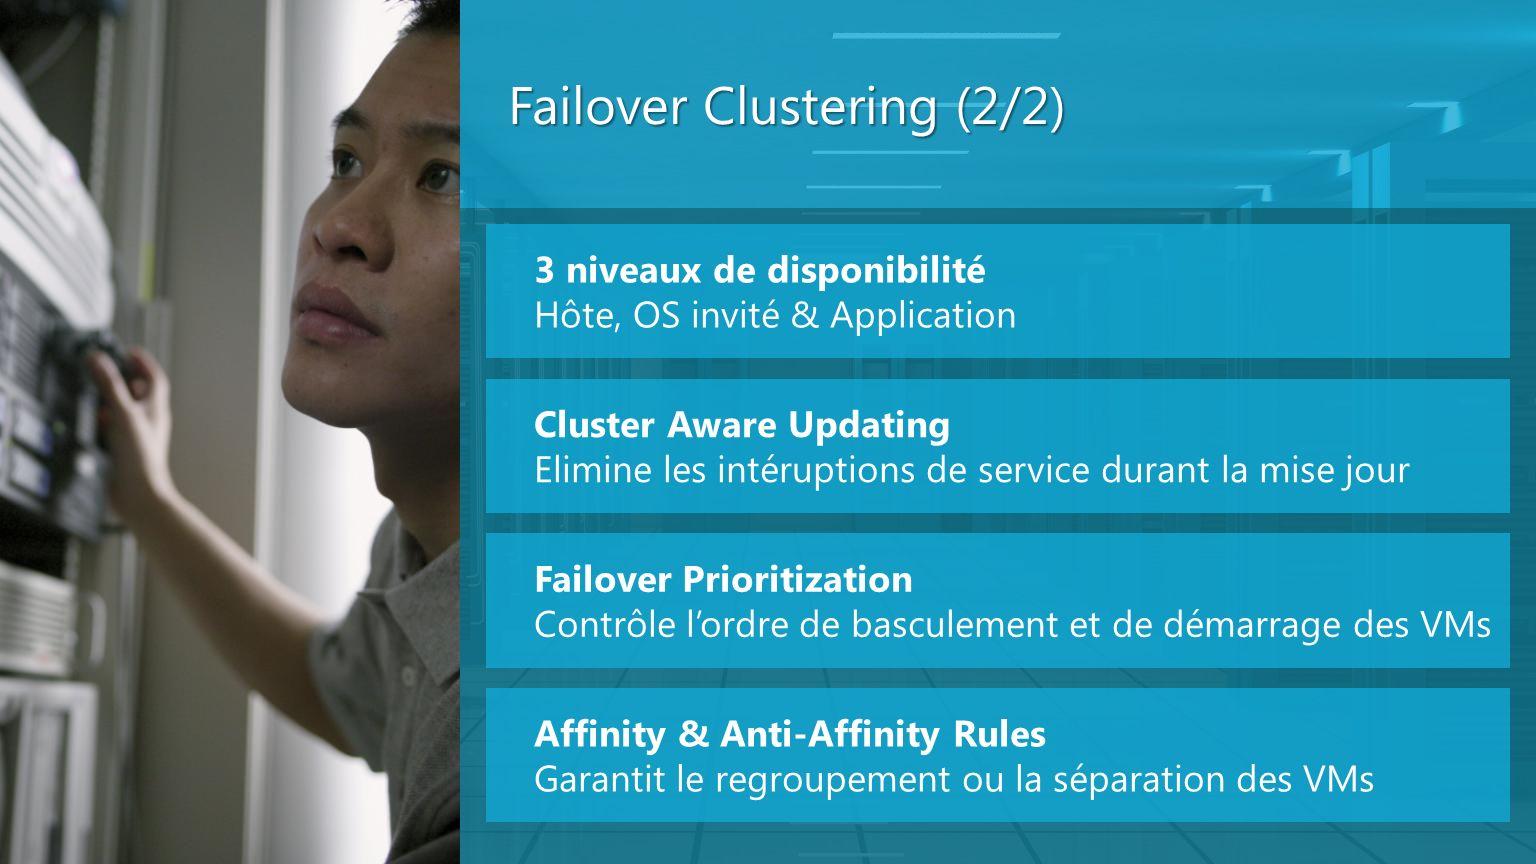 Failover Clustering (2/2)